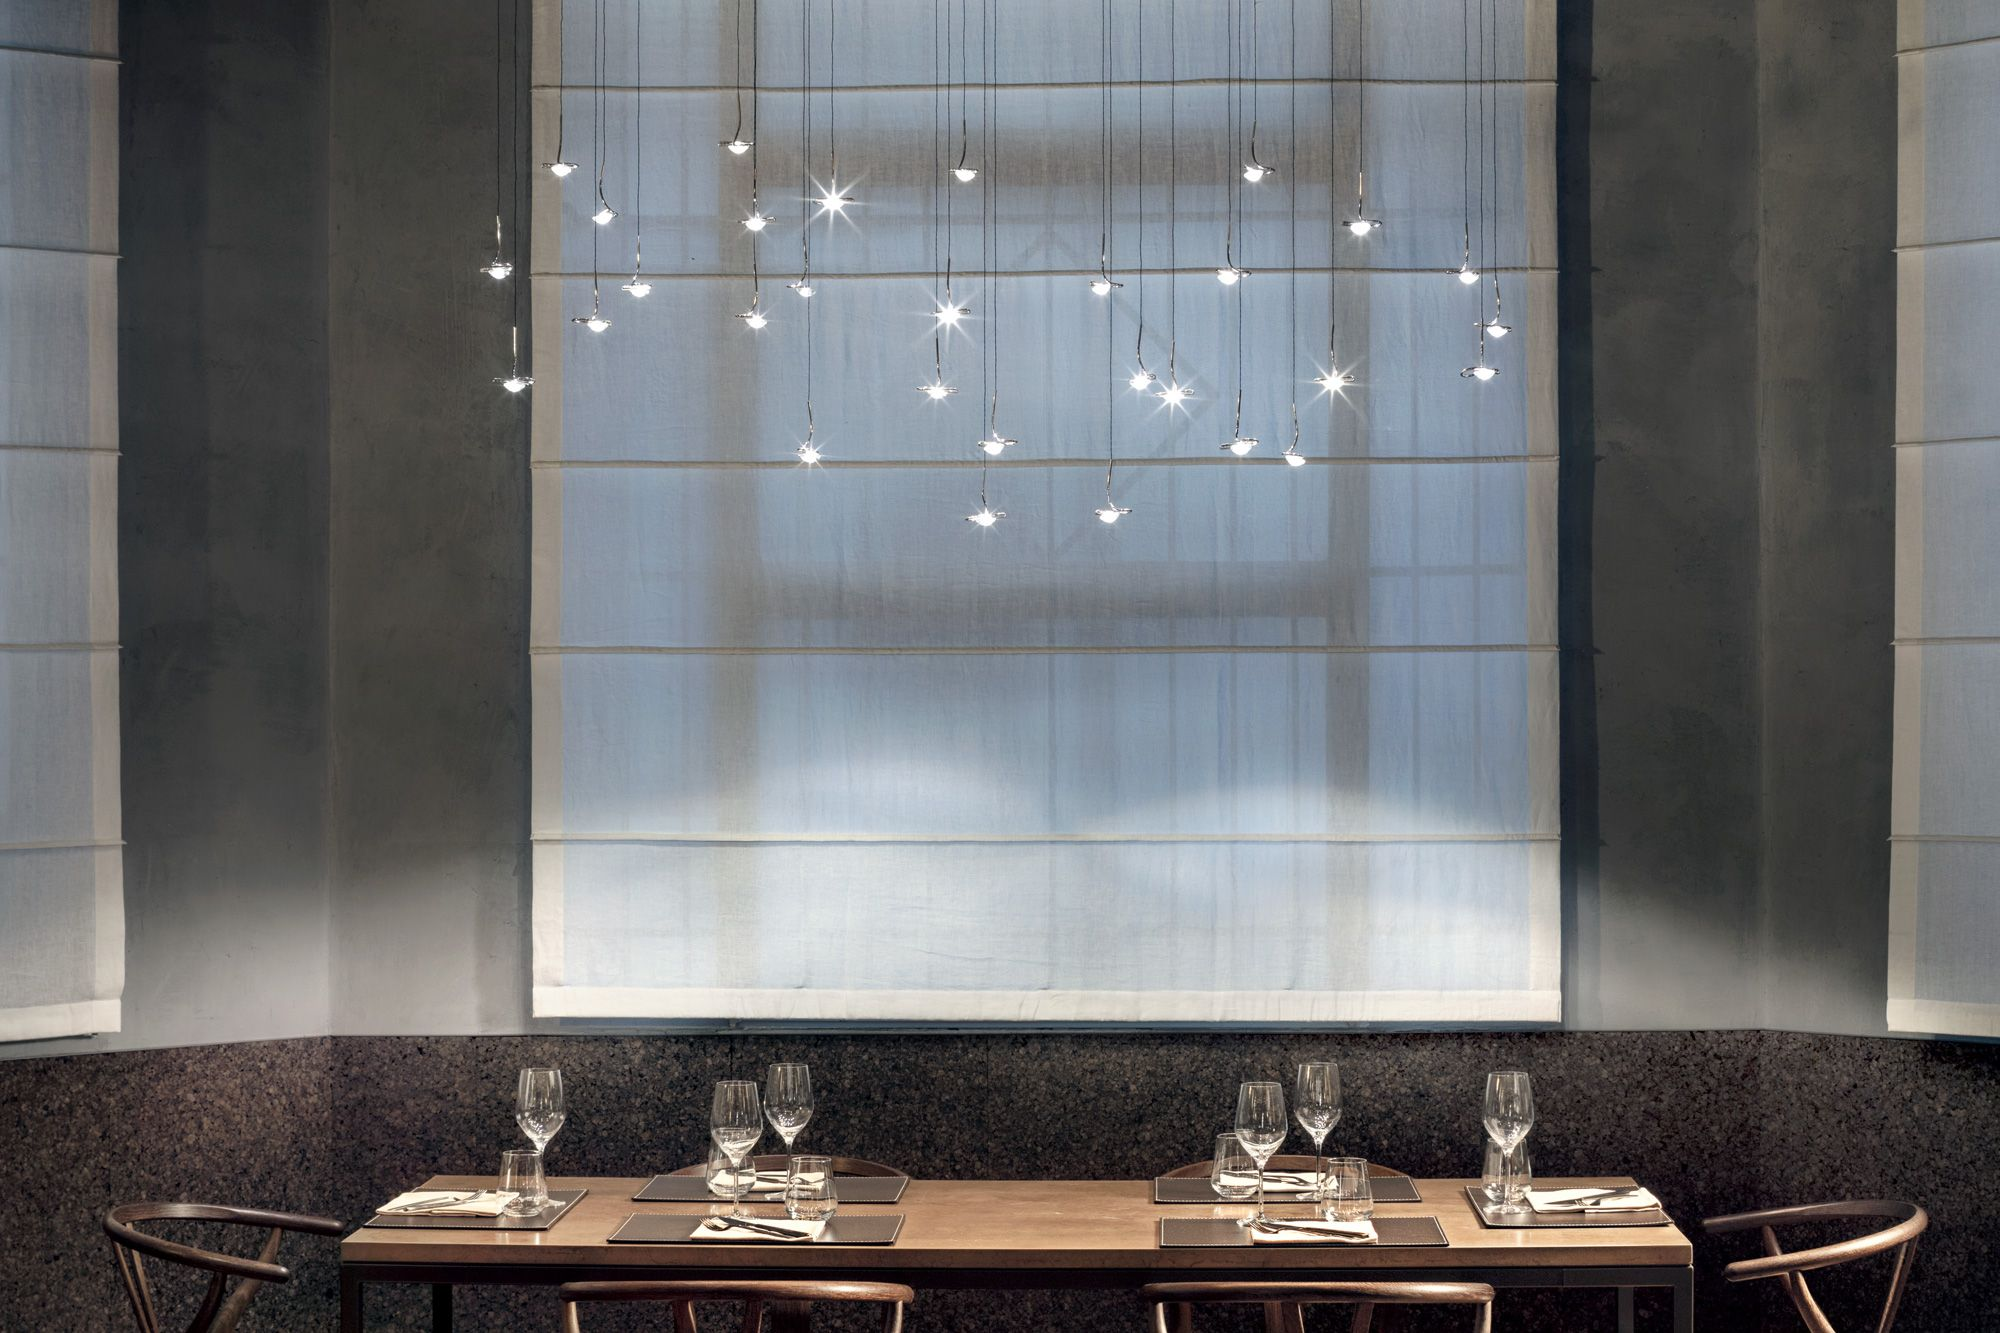 Cenerè restaurant in 2019 interior retail bathroom lighting